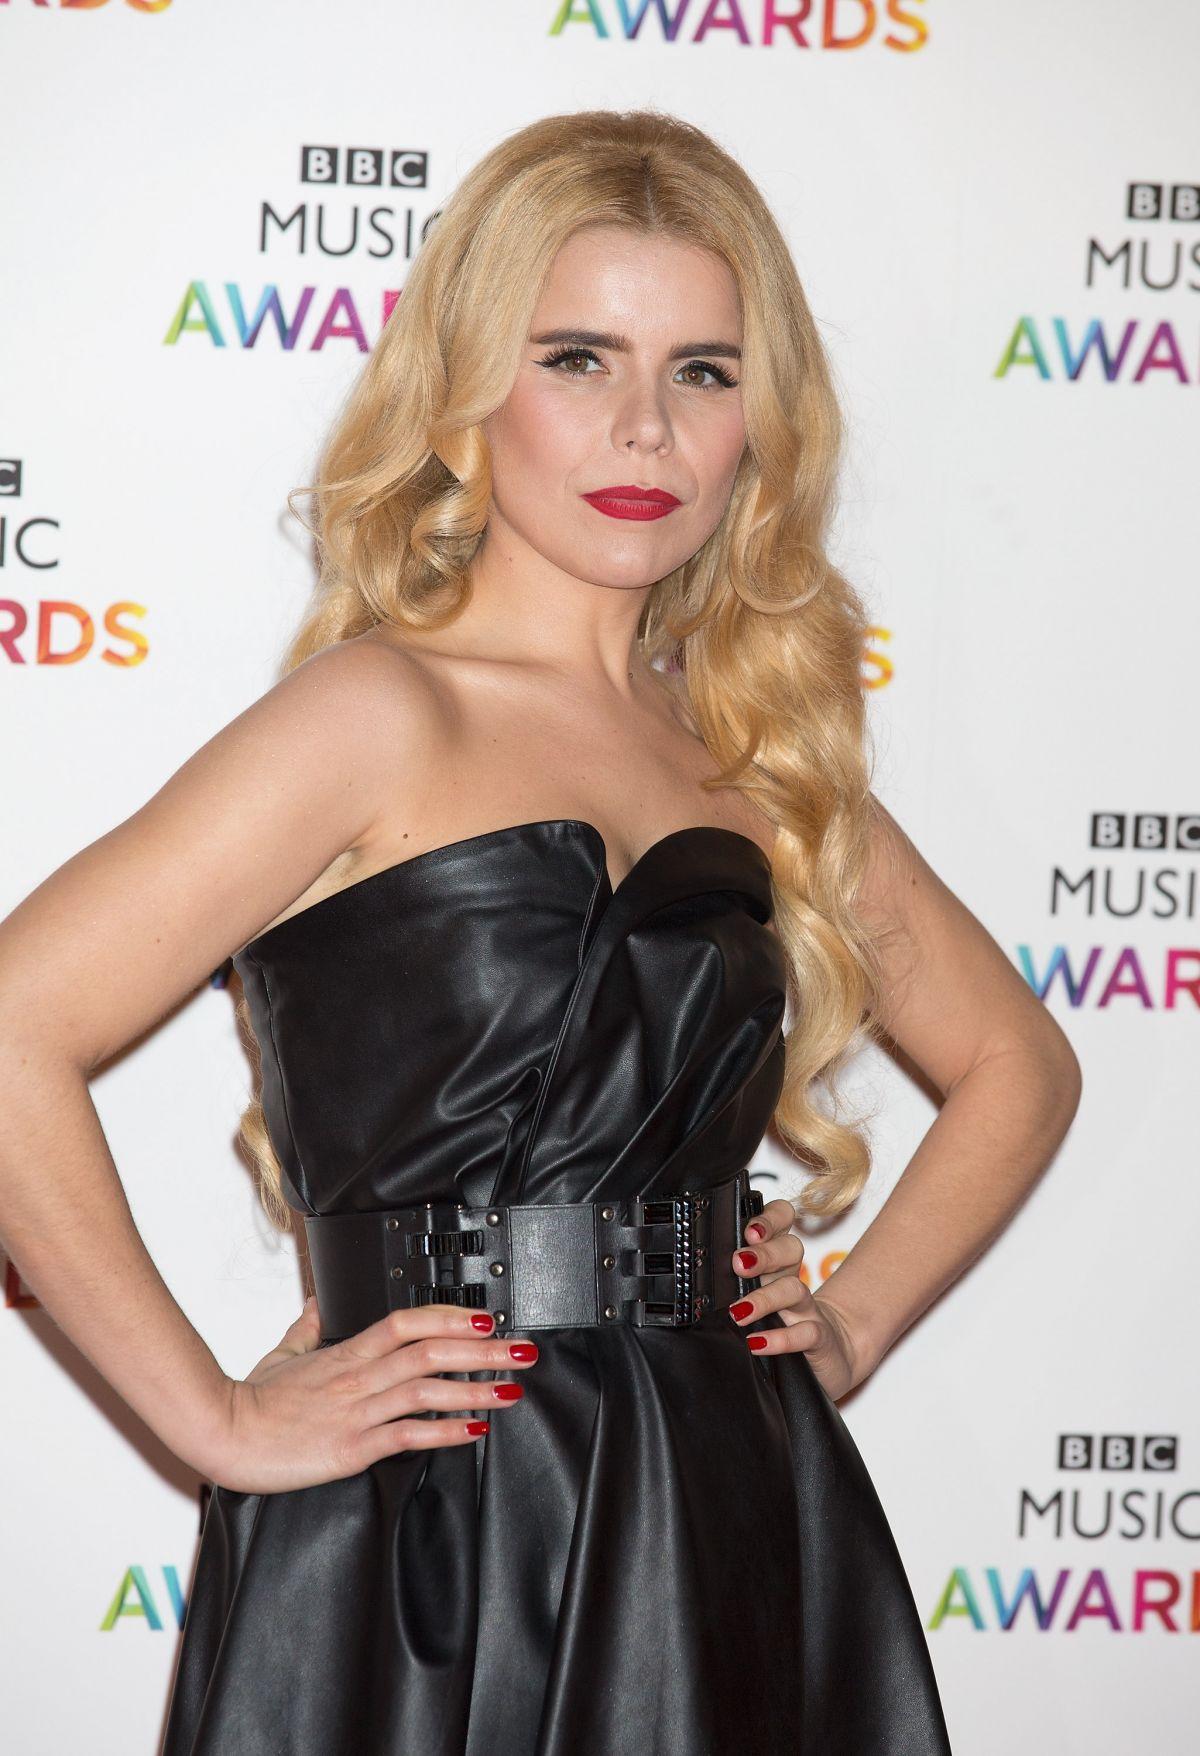 PALOMA FAITH at BBC Music Awards in London - HawtCelebs - HawtCelebs